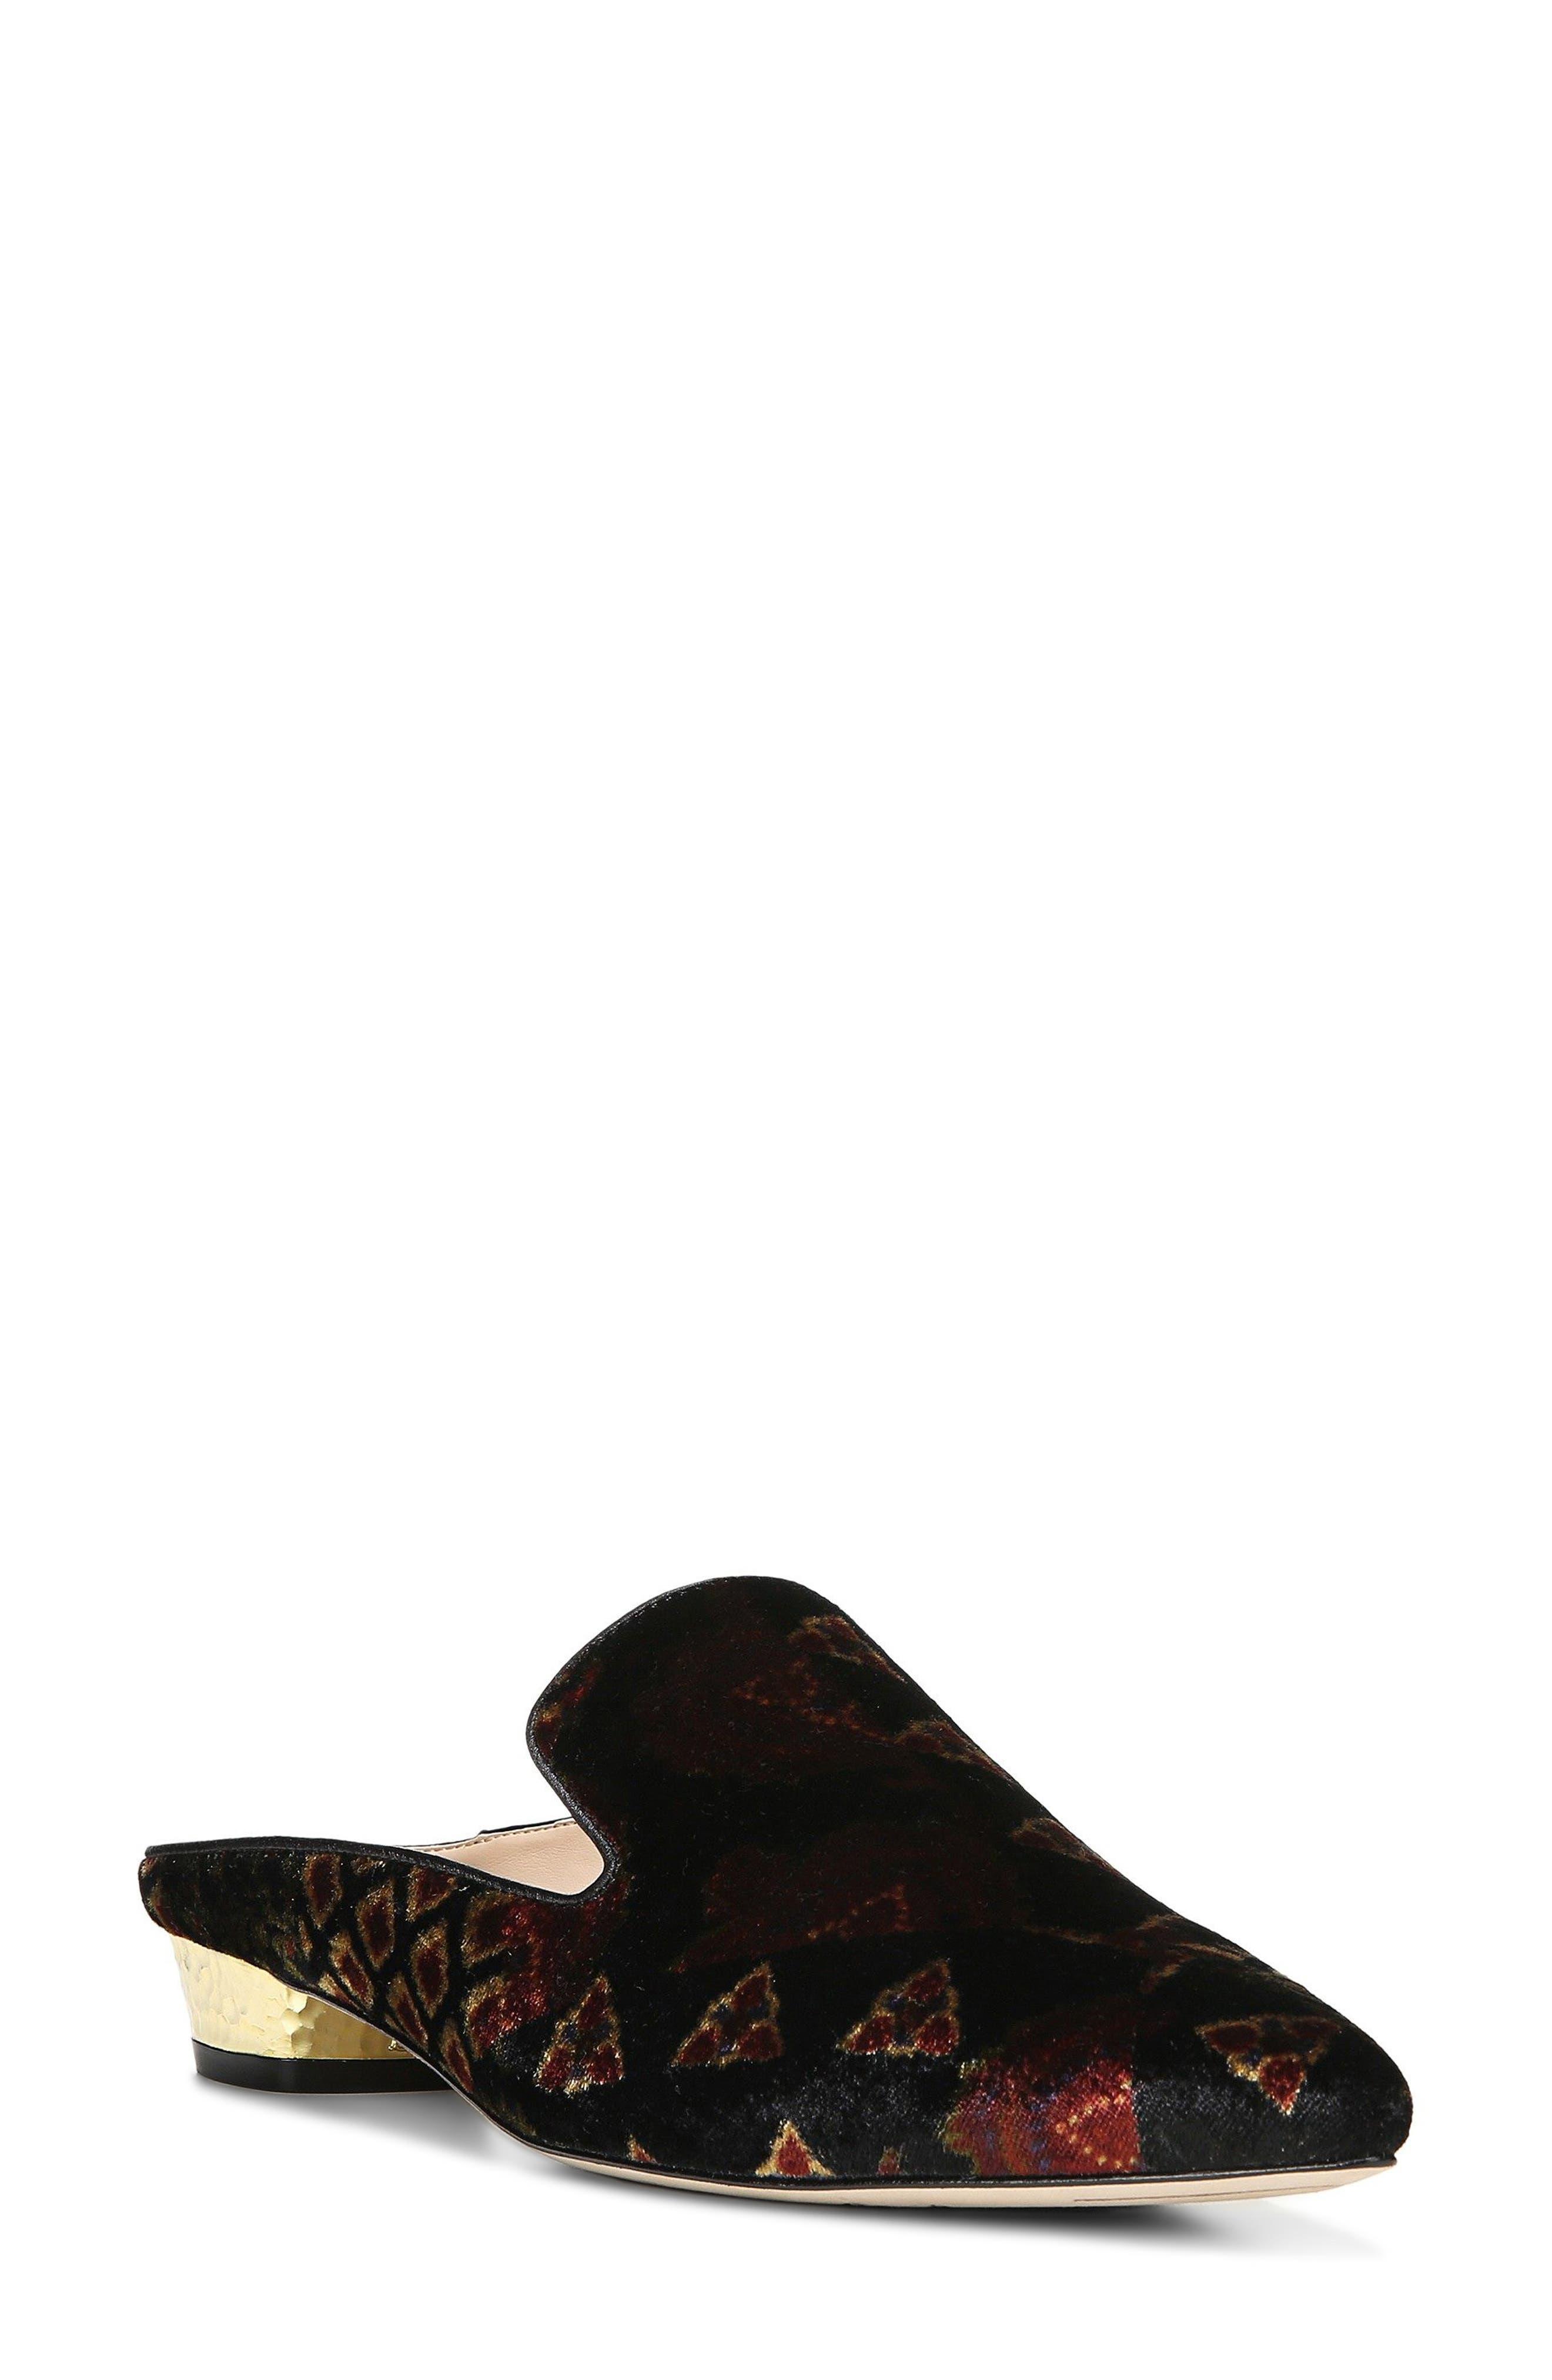 Alternate Image 1 Selected - Sam Edelman Augustine Patterned Loafer Mule (Women)